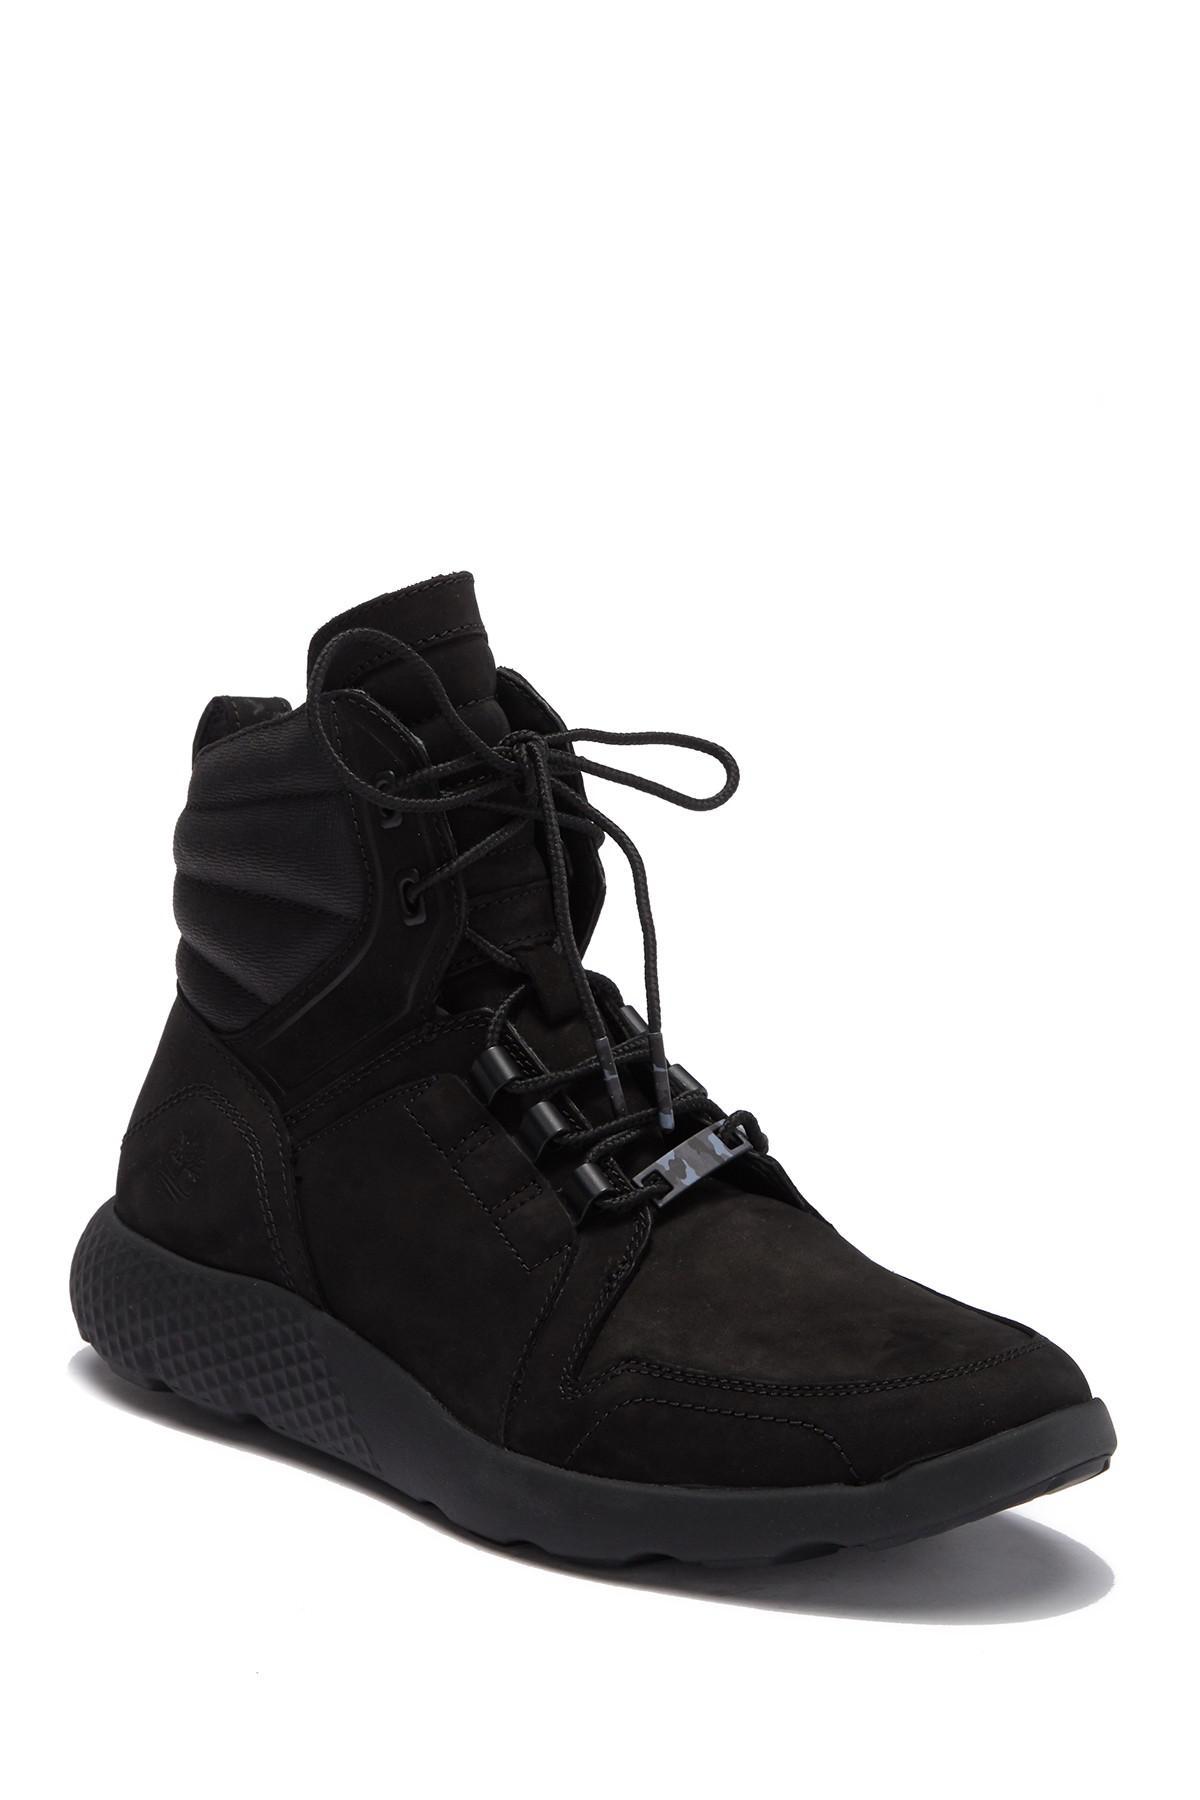 558a6a4eefc0 Lyst - Timberland Flyroam Leather Hi-top Sneaker Boot in Black for Men